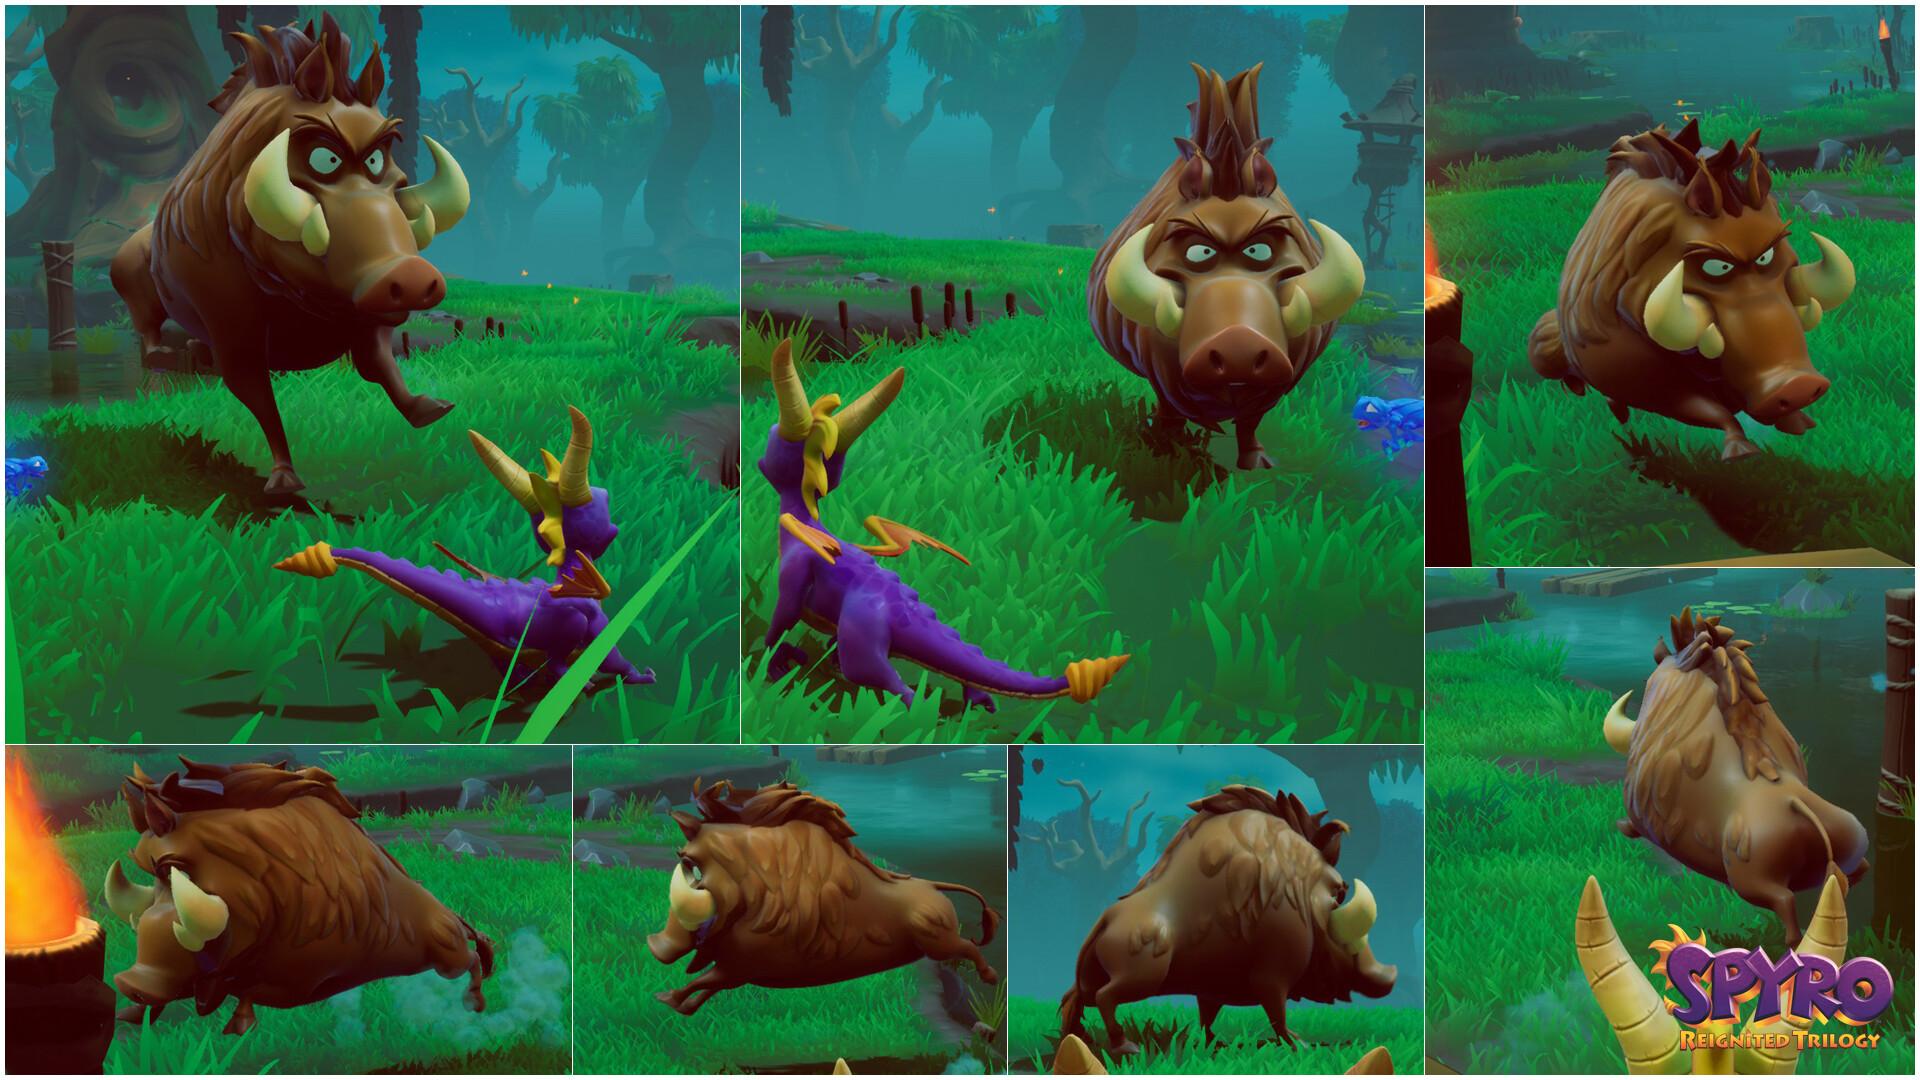 Alexandra jackson spyrotrilogy boar collage